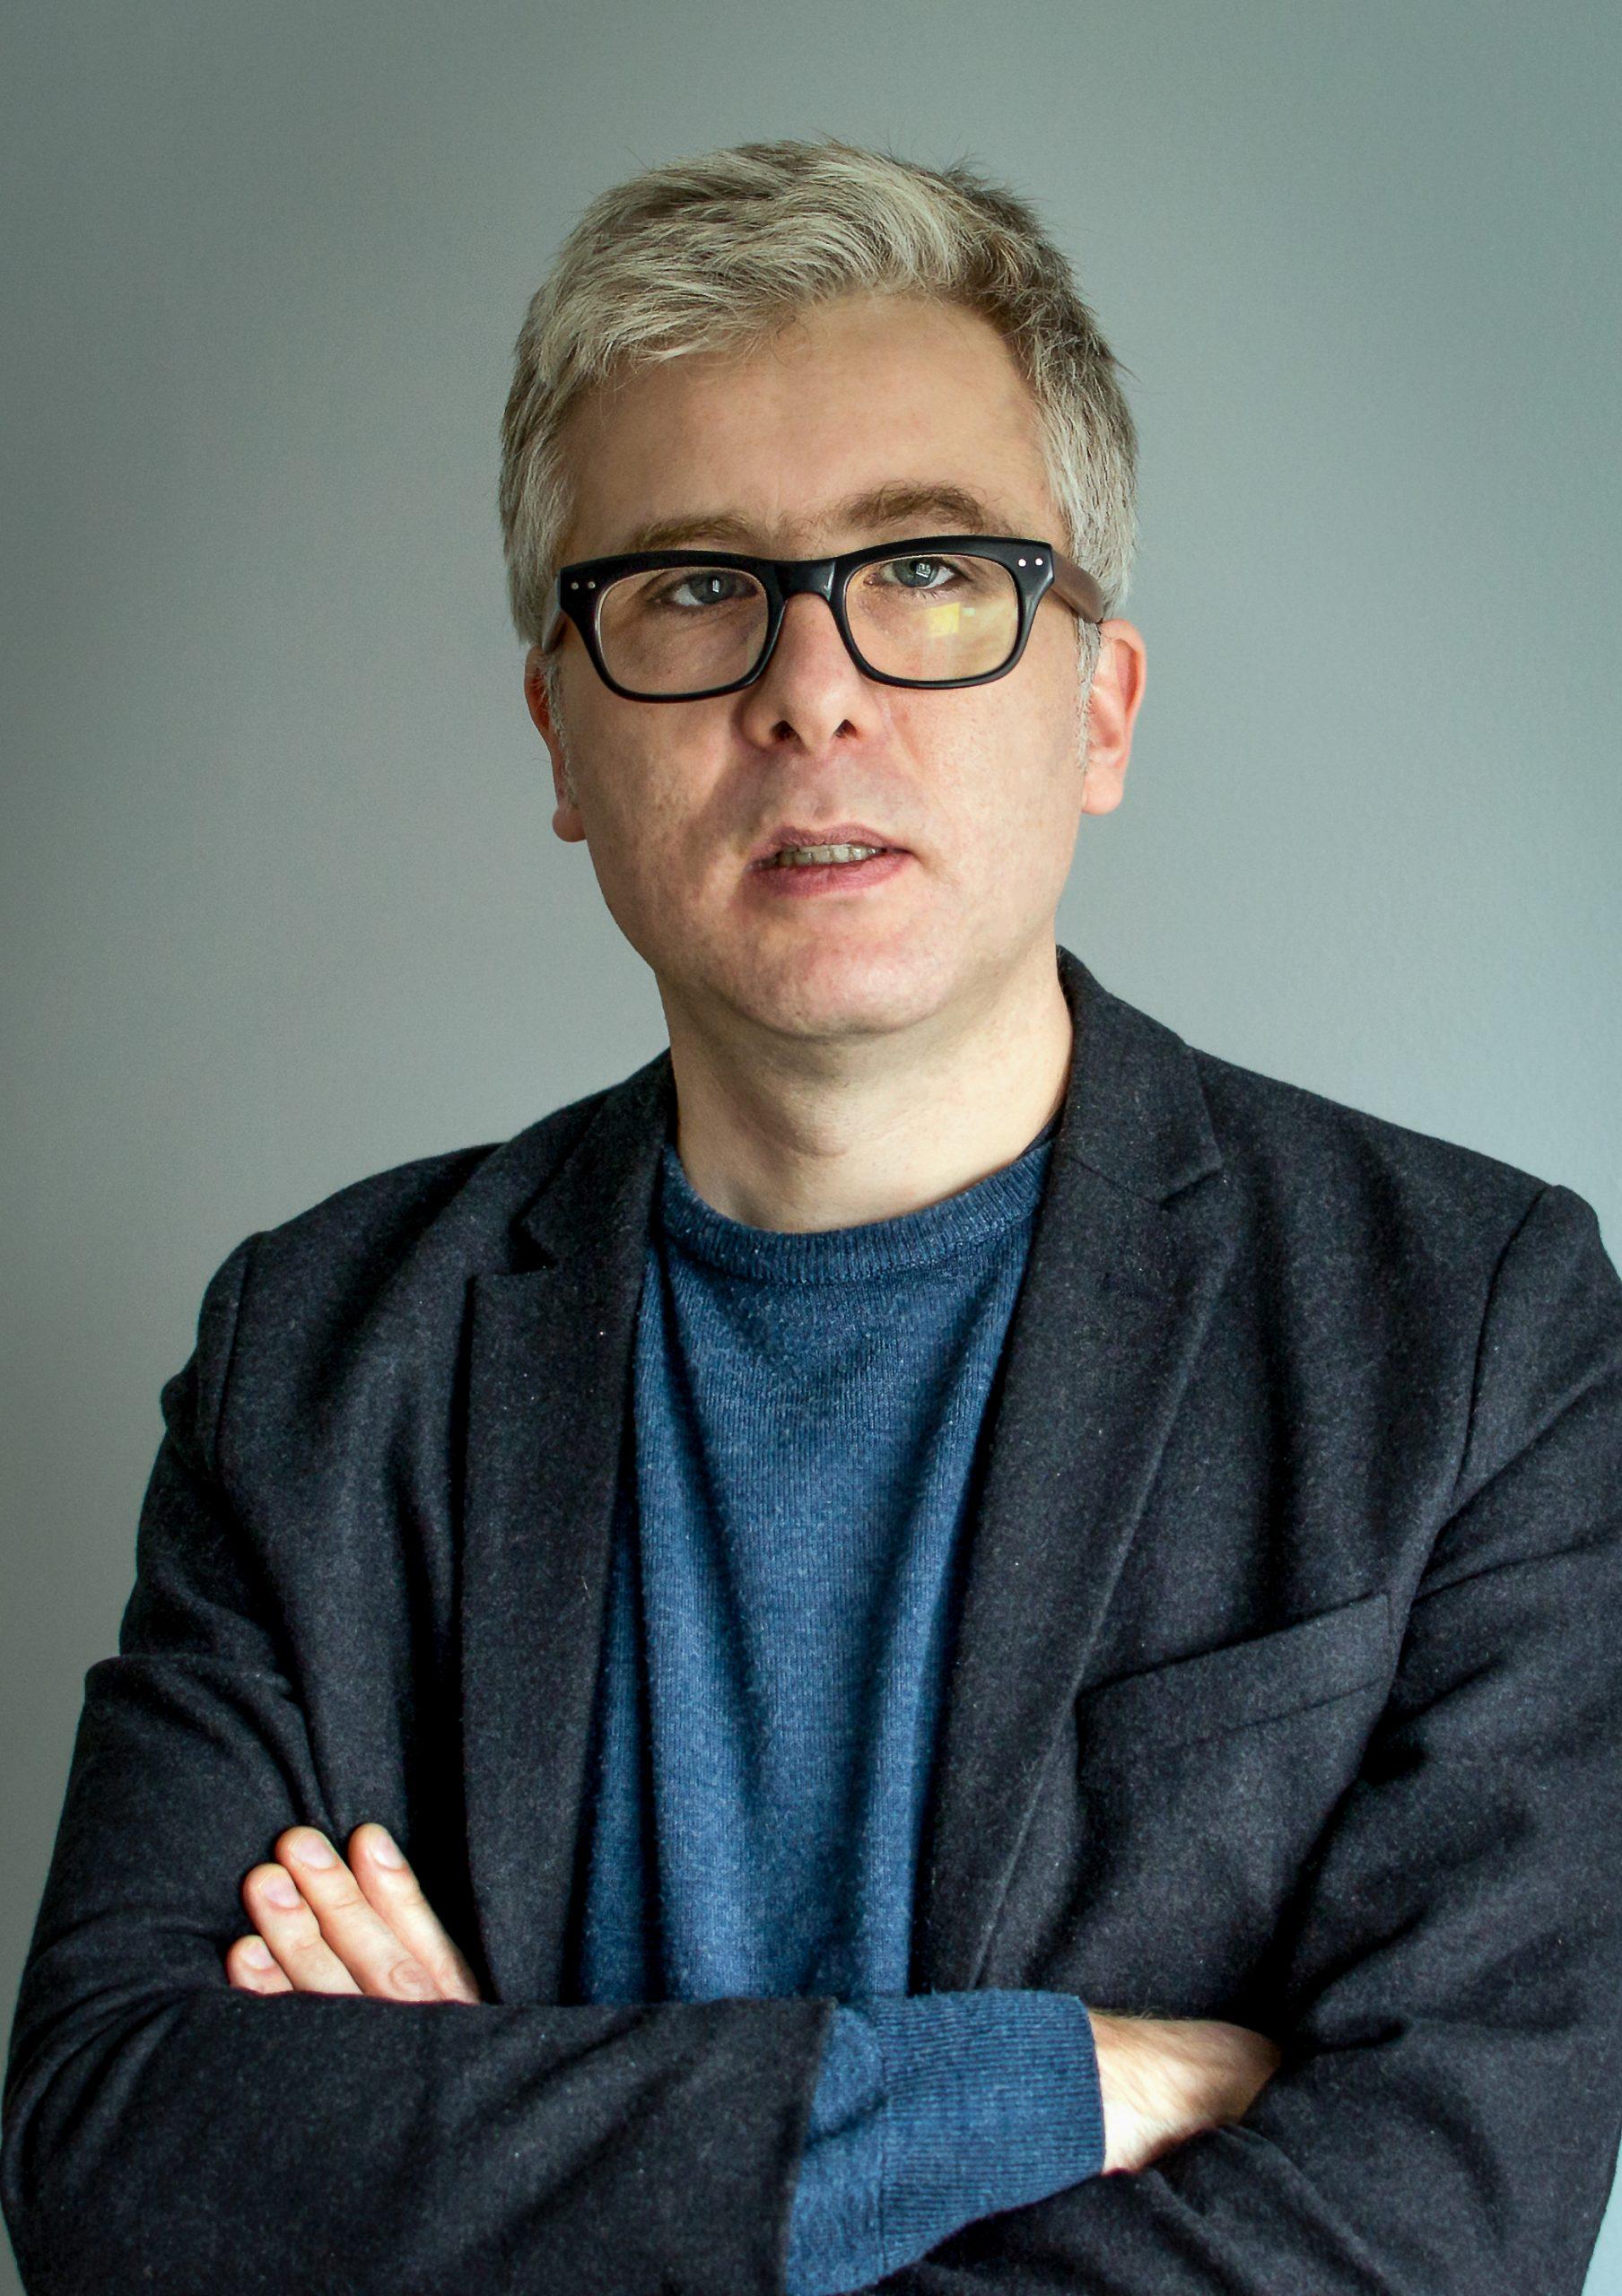 prof. Maciej Kowalewski